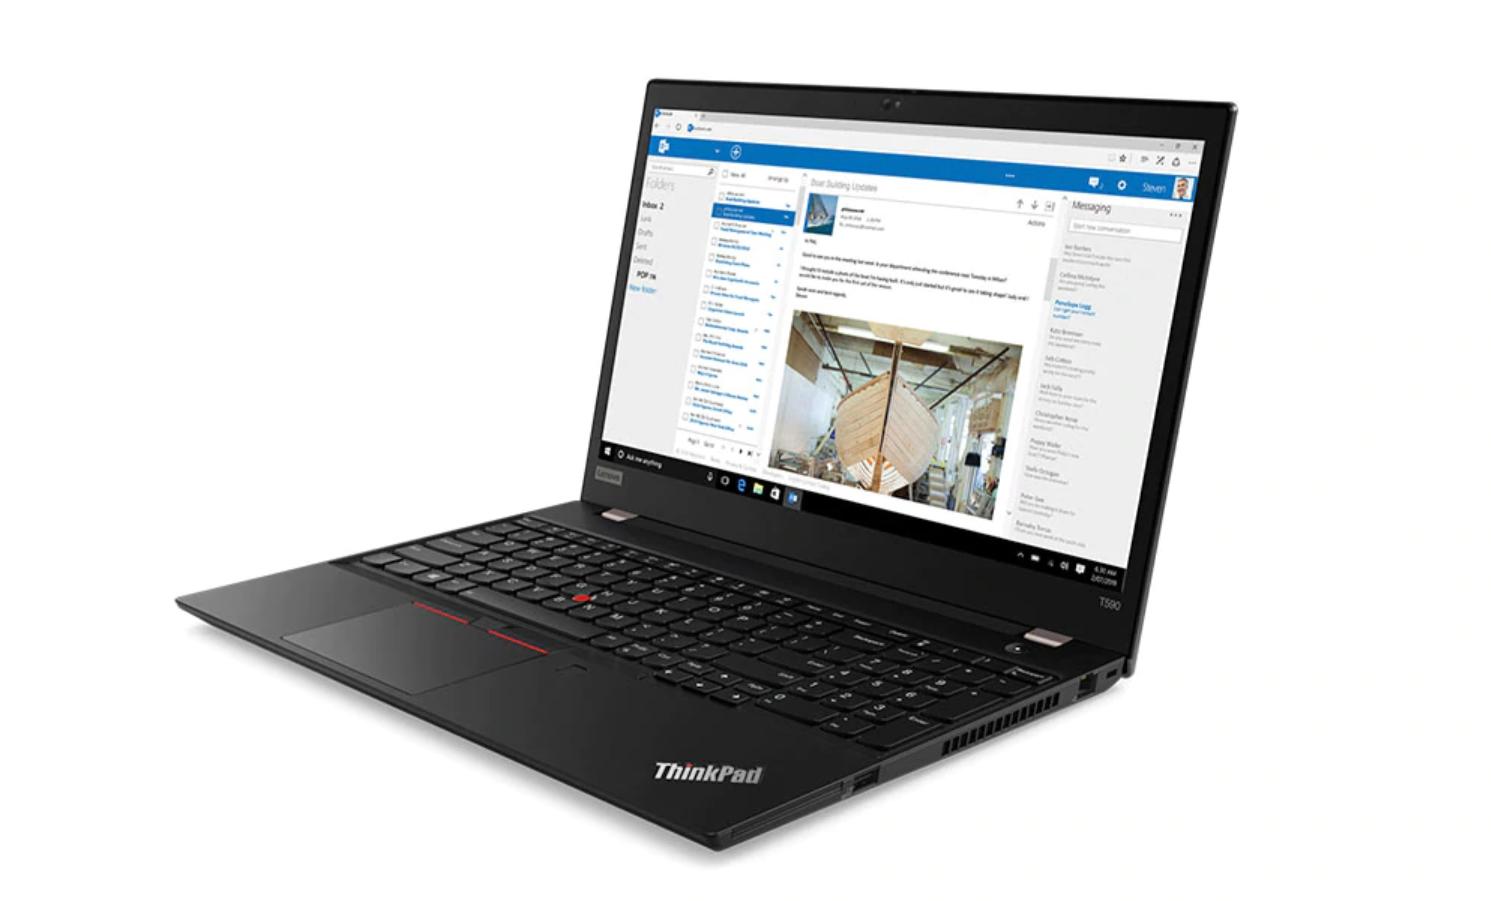 Lenovo ThinkPad T590 i5 15.6 IPS 1920x1080  8G 16G 24GB NVMe